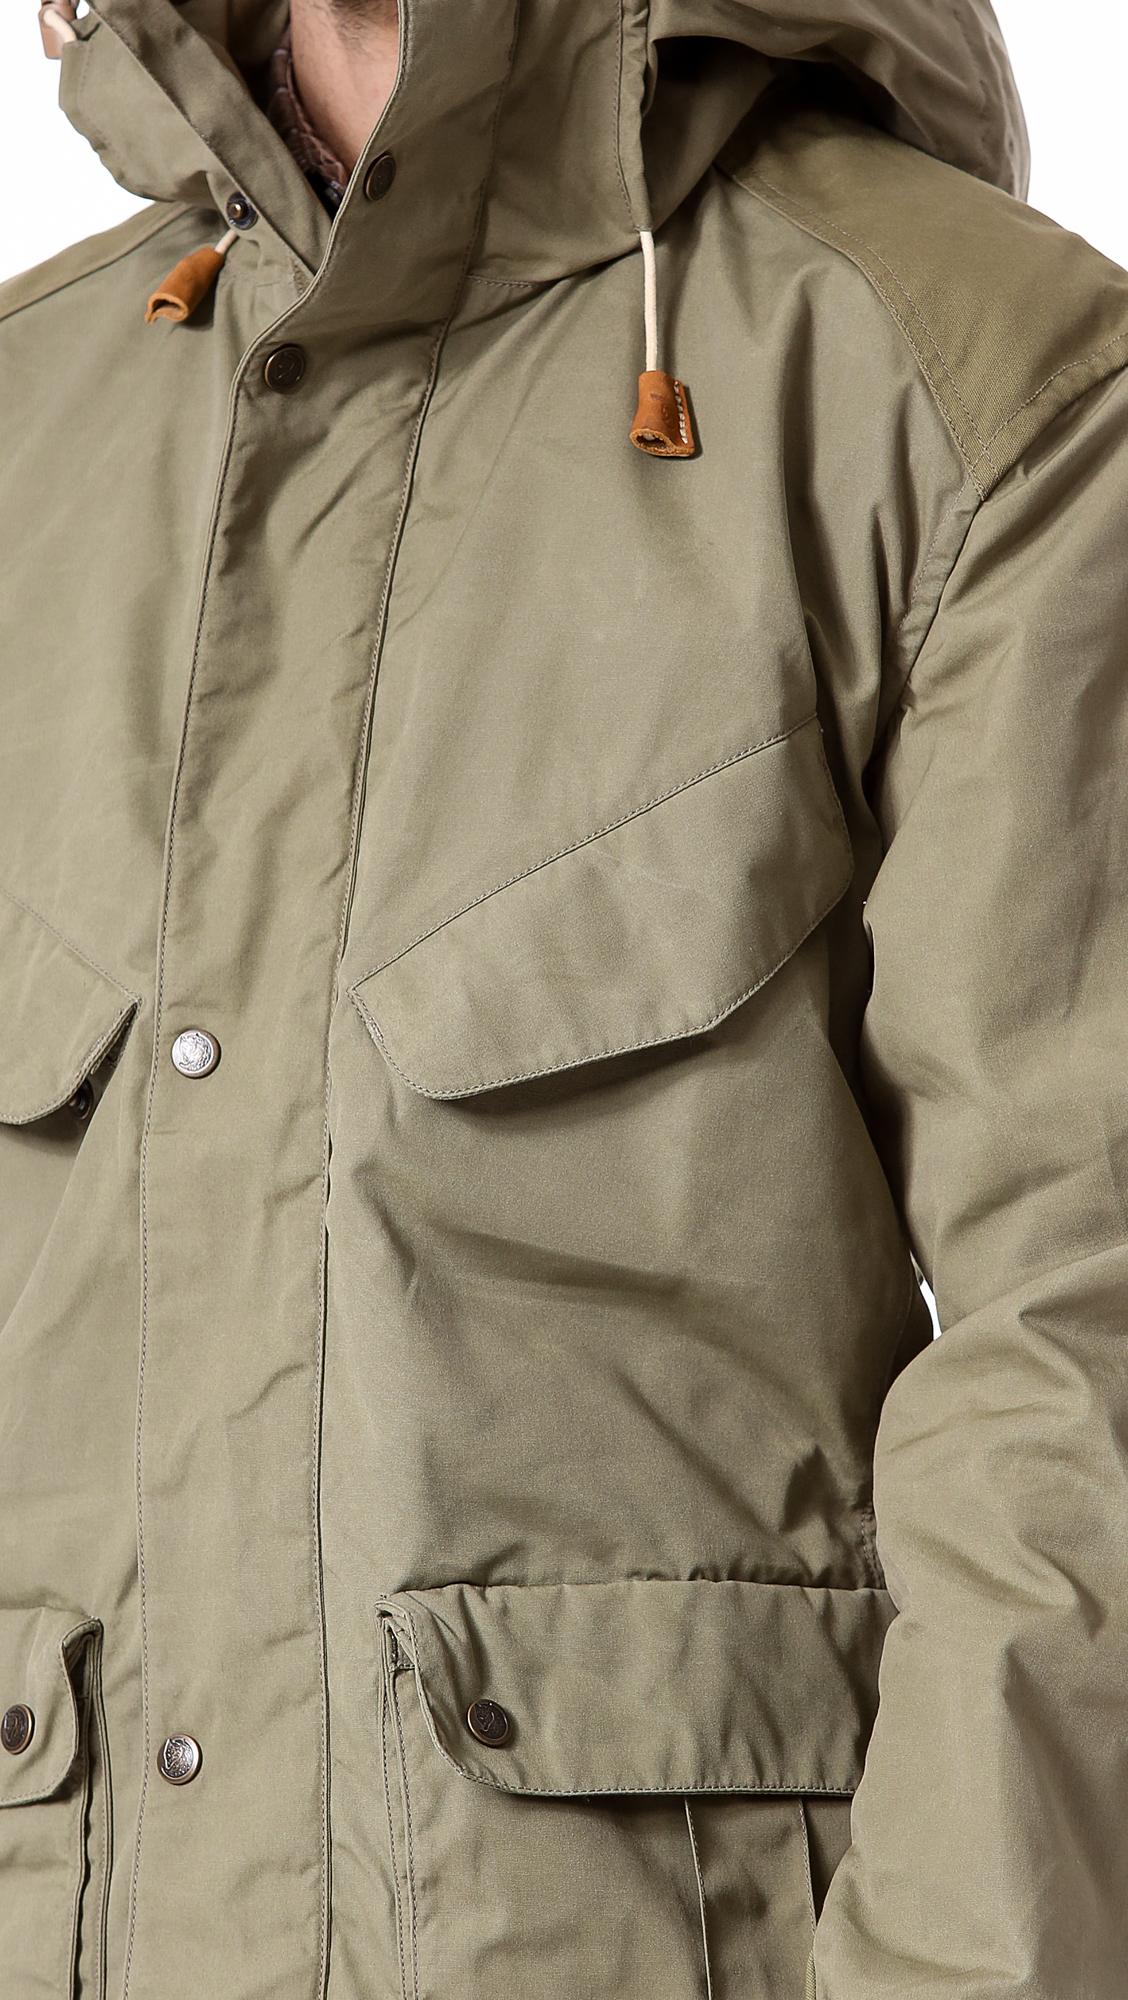 Fjallraven Jacket No 68 In Green For Men Lyst